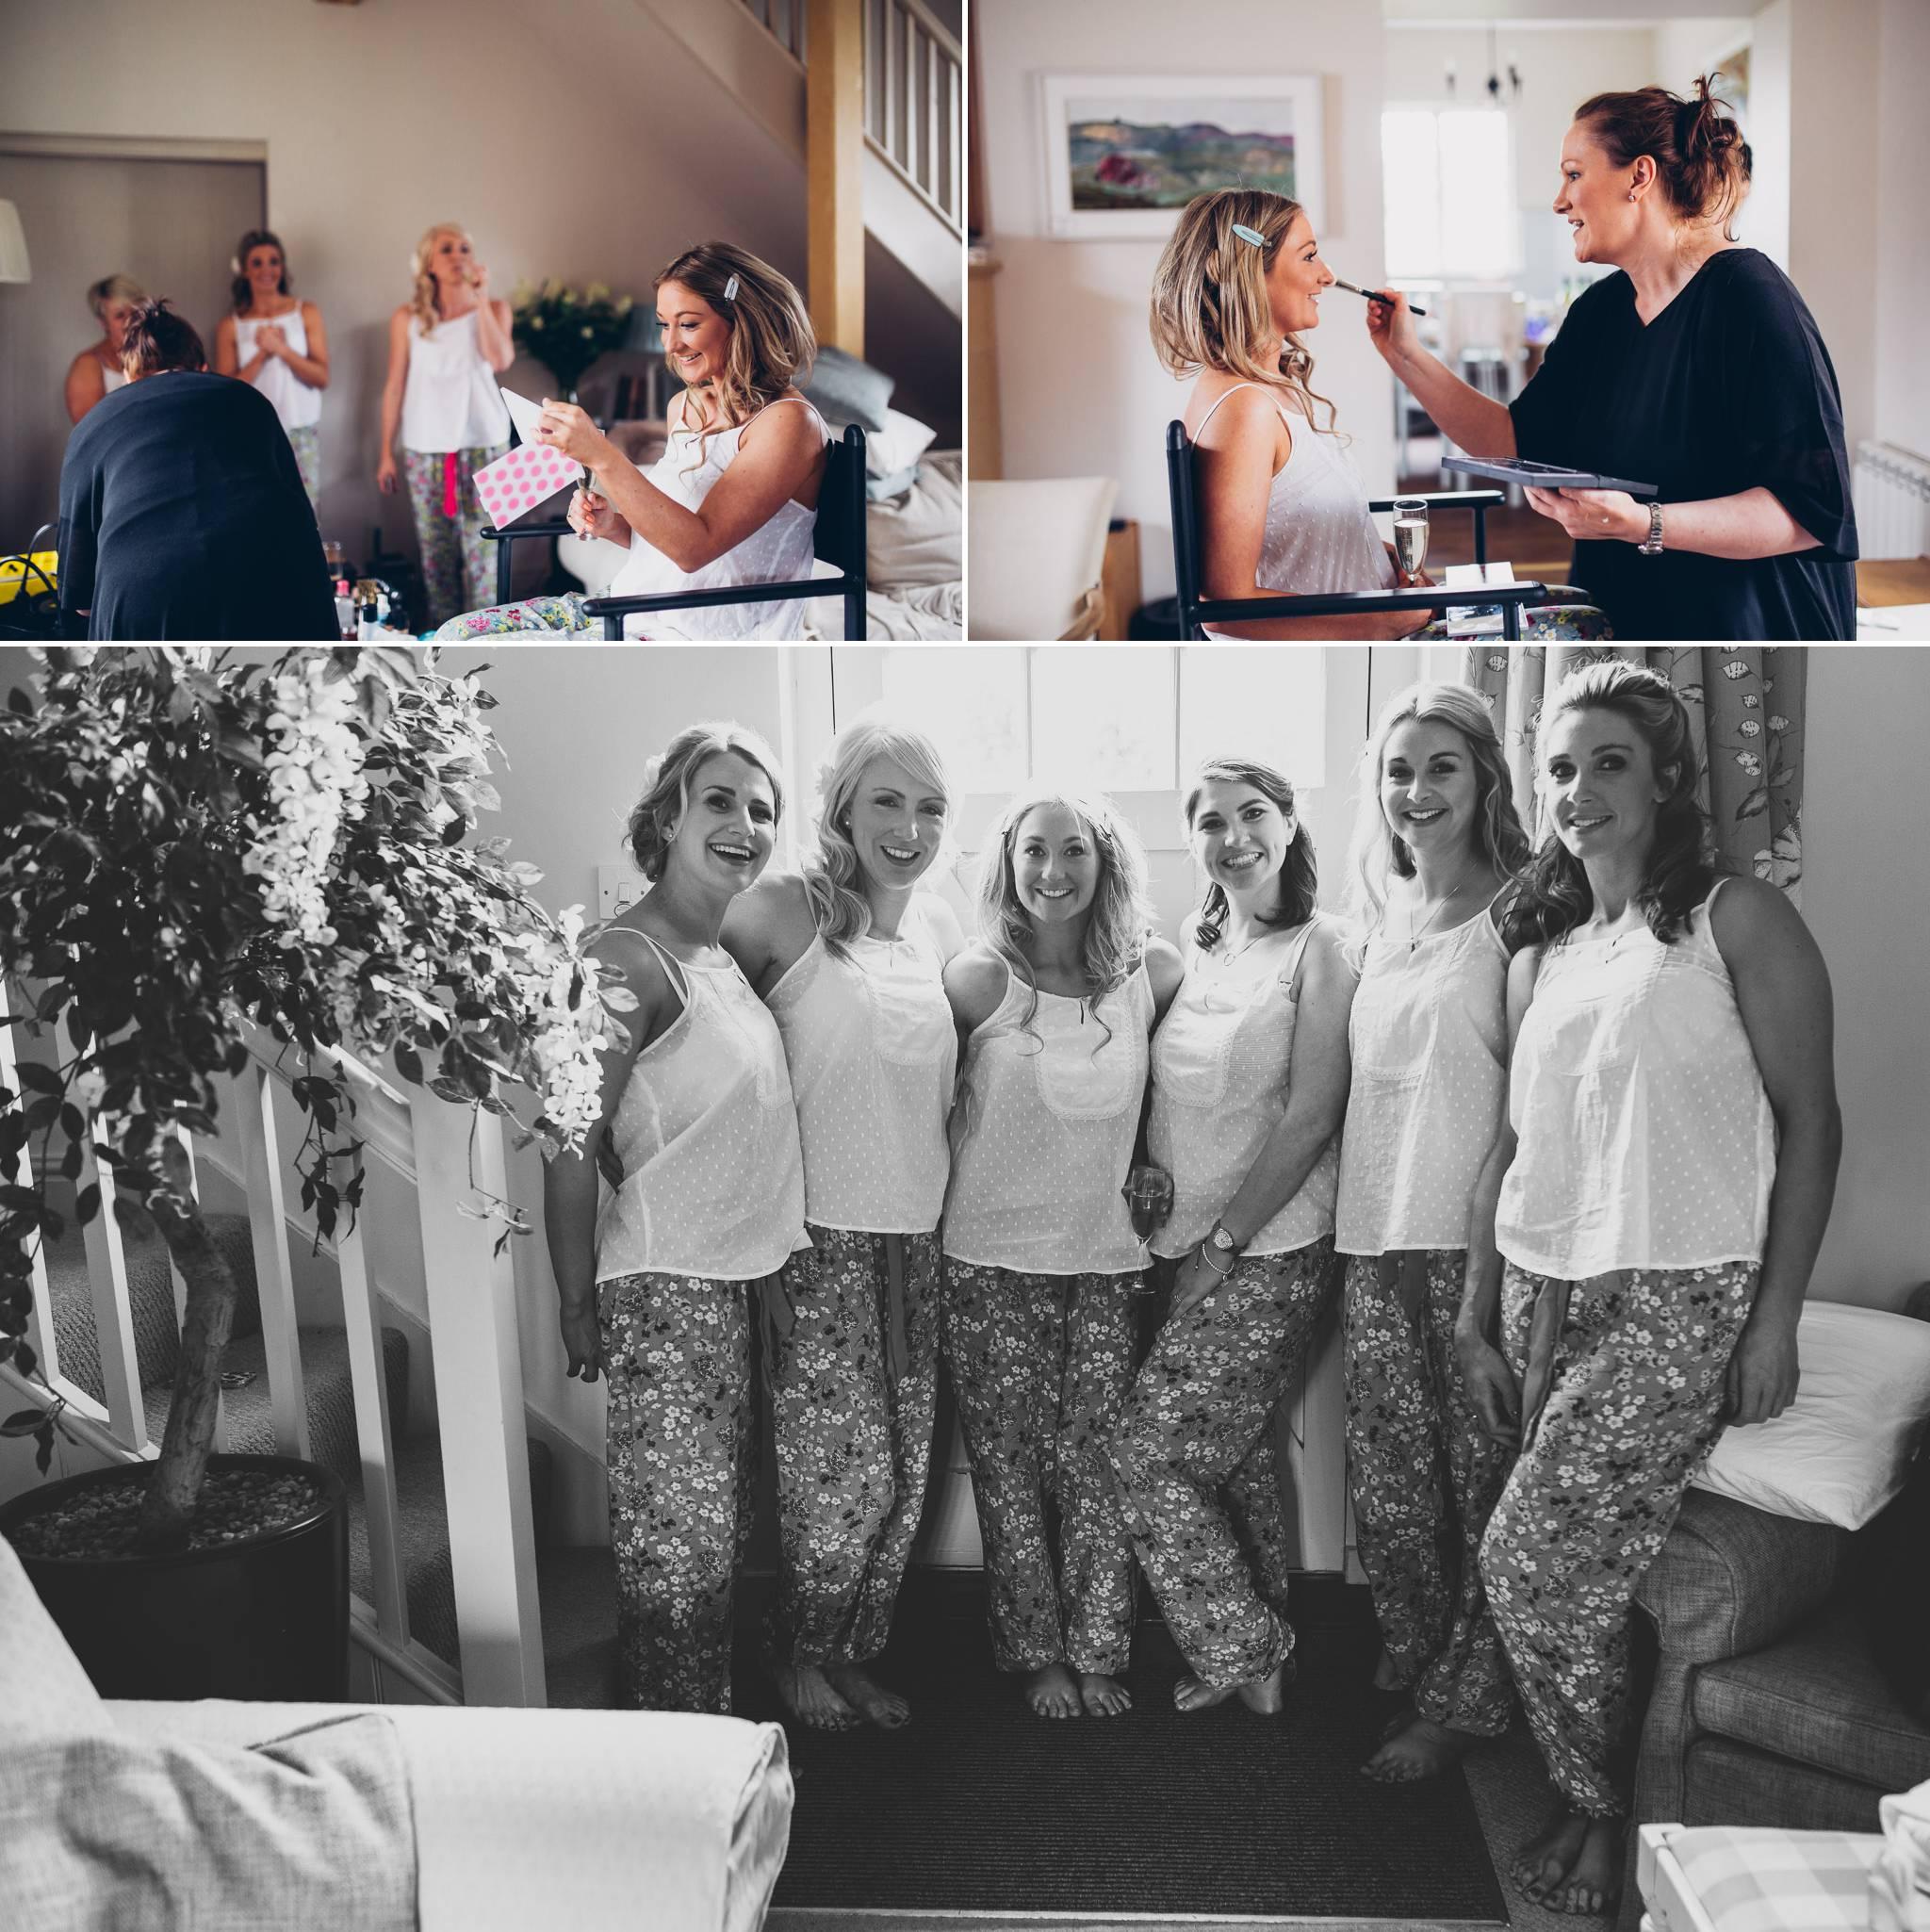 shropshire-wedding-photography 3.jpg